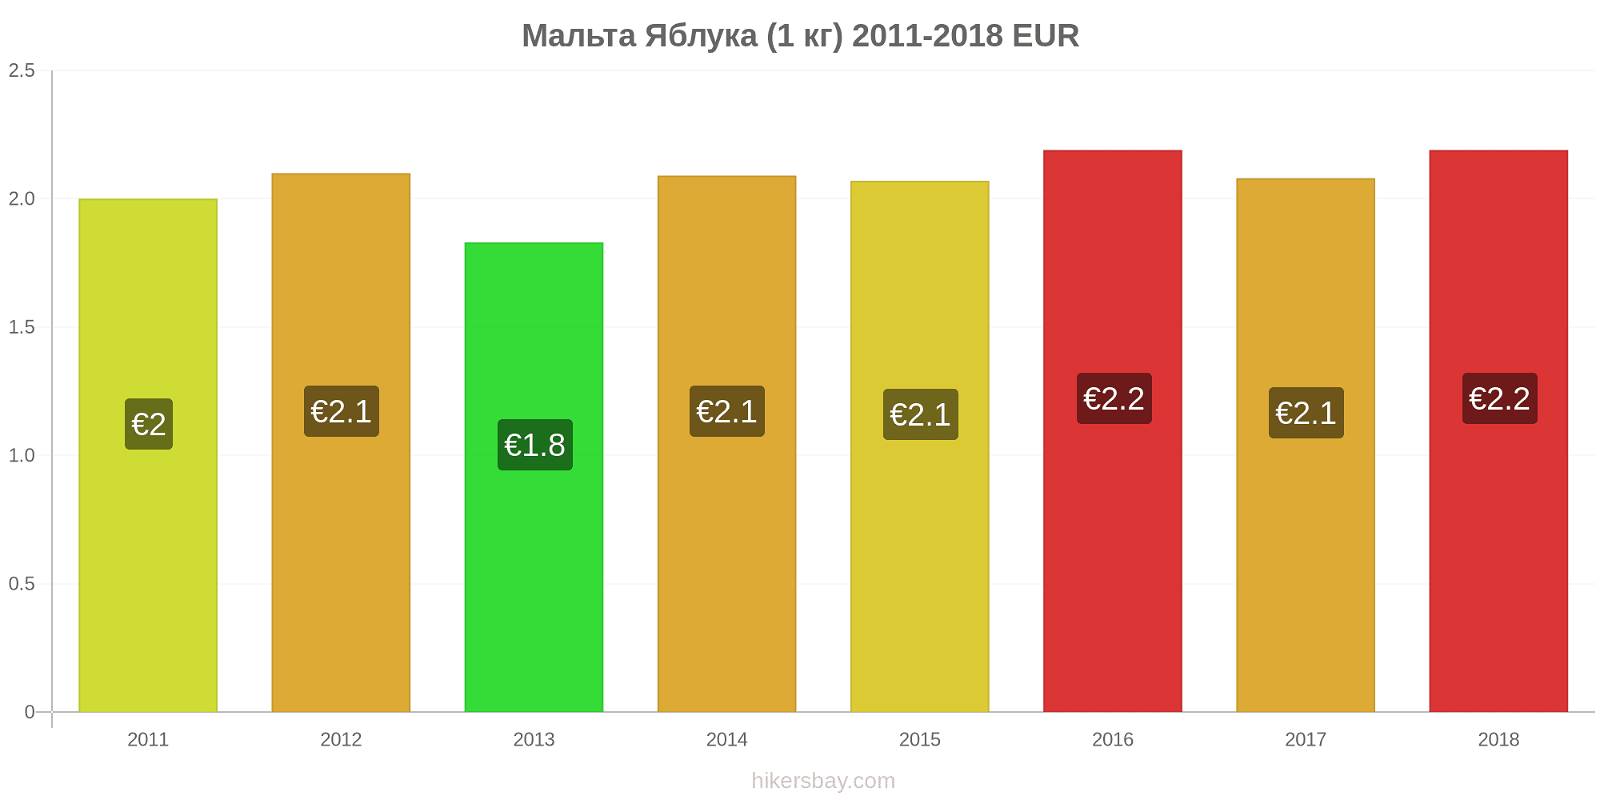 Мальта зміни цін Яблука (1 кг) hikersbay.com